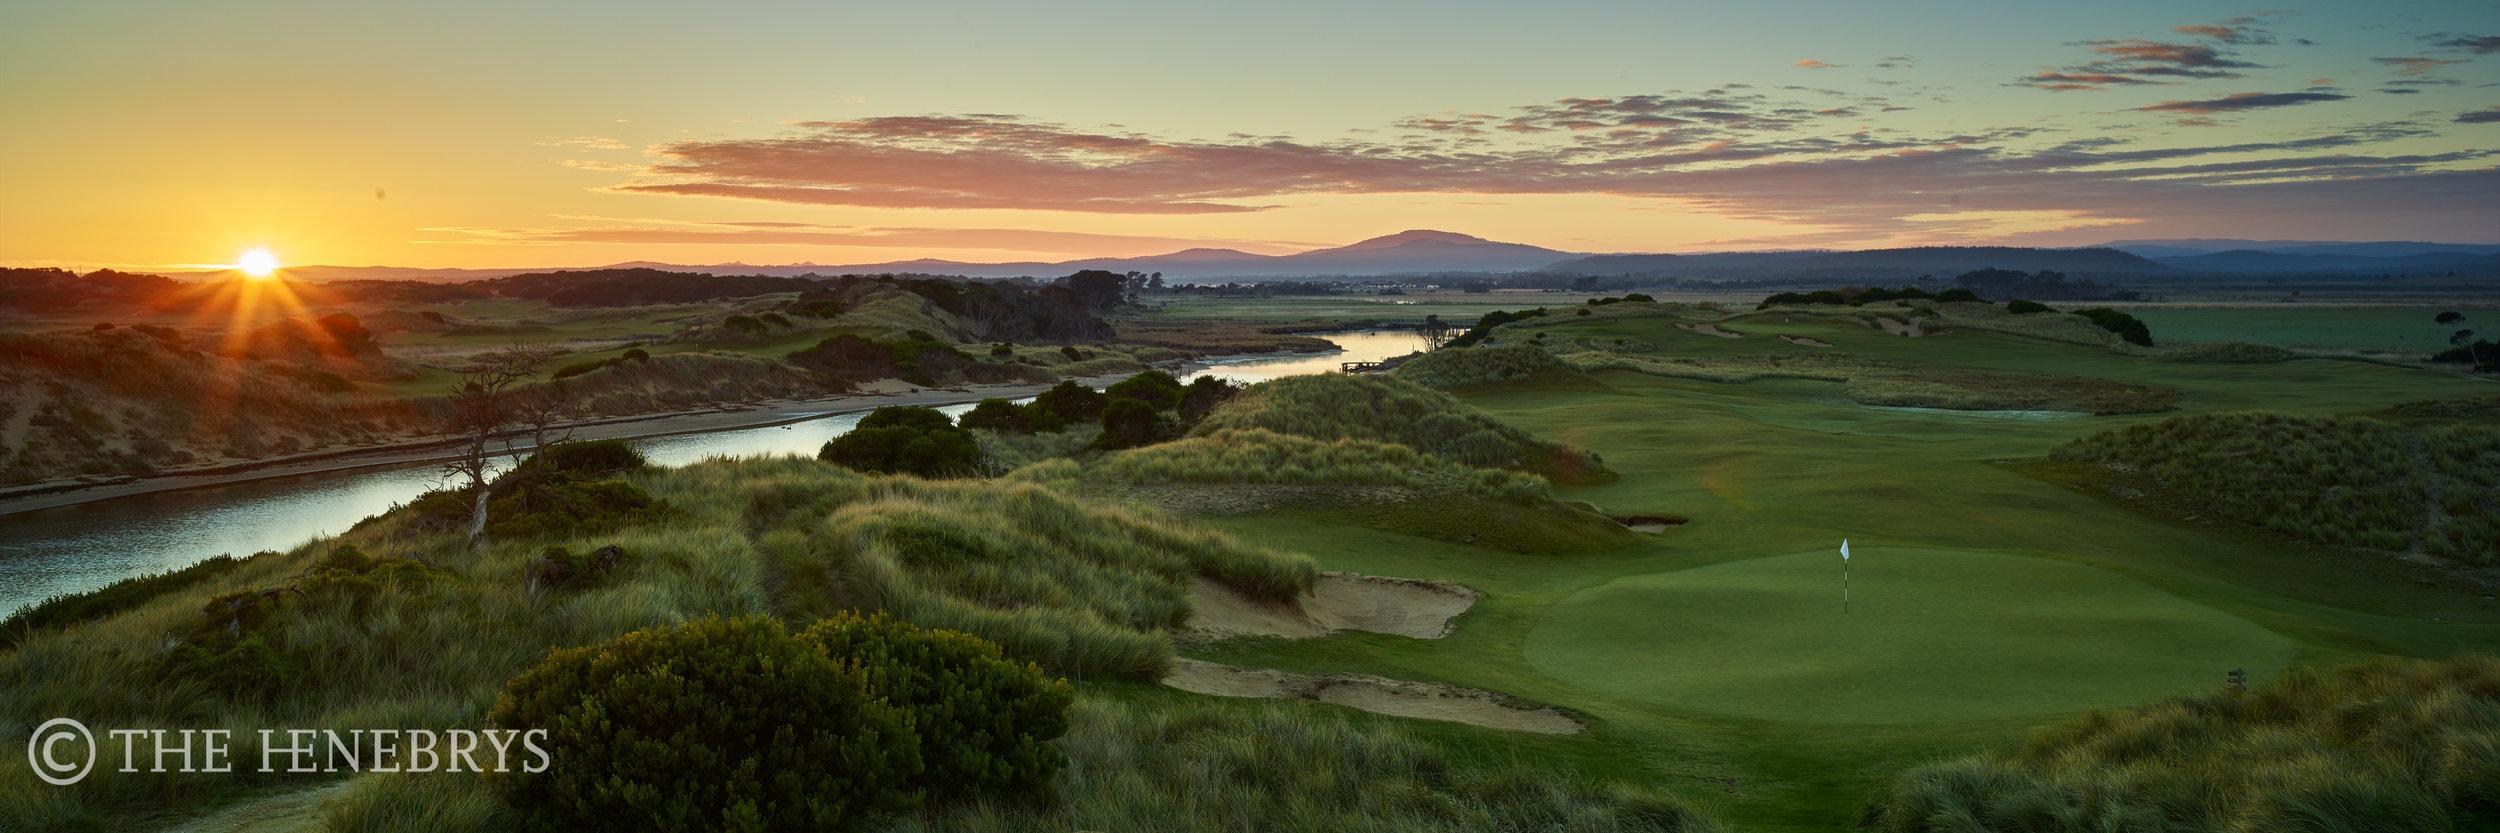 Barnbougle Dunes Golf Links #15, Tasmania, Australia